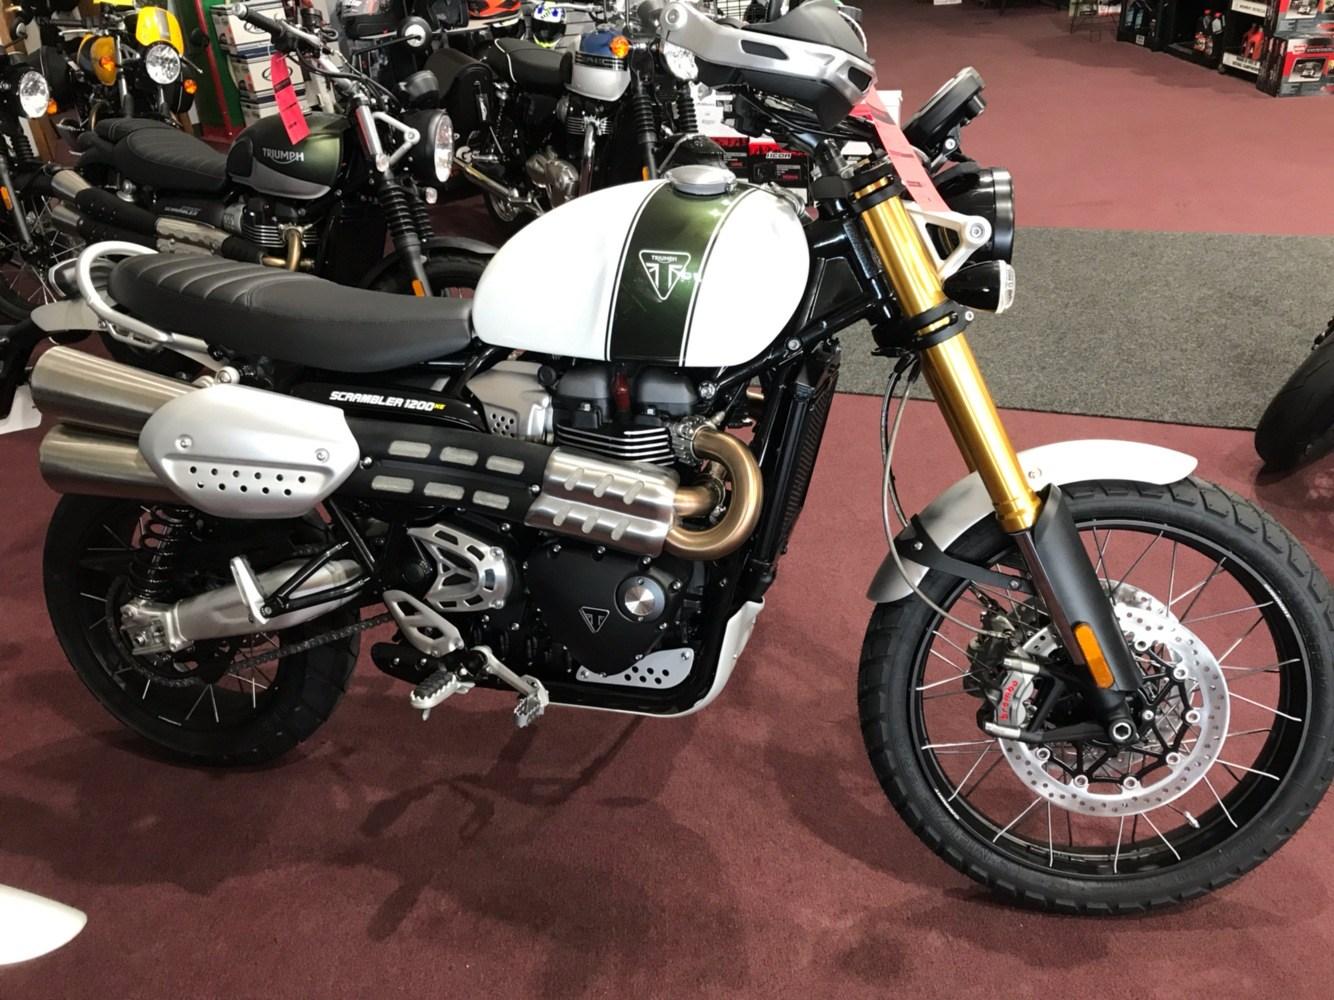 2019 Triumph Scrambler 1200 Xe Motorcycles Belle Plaine Minnesota